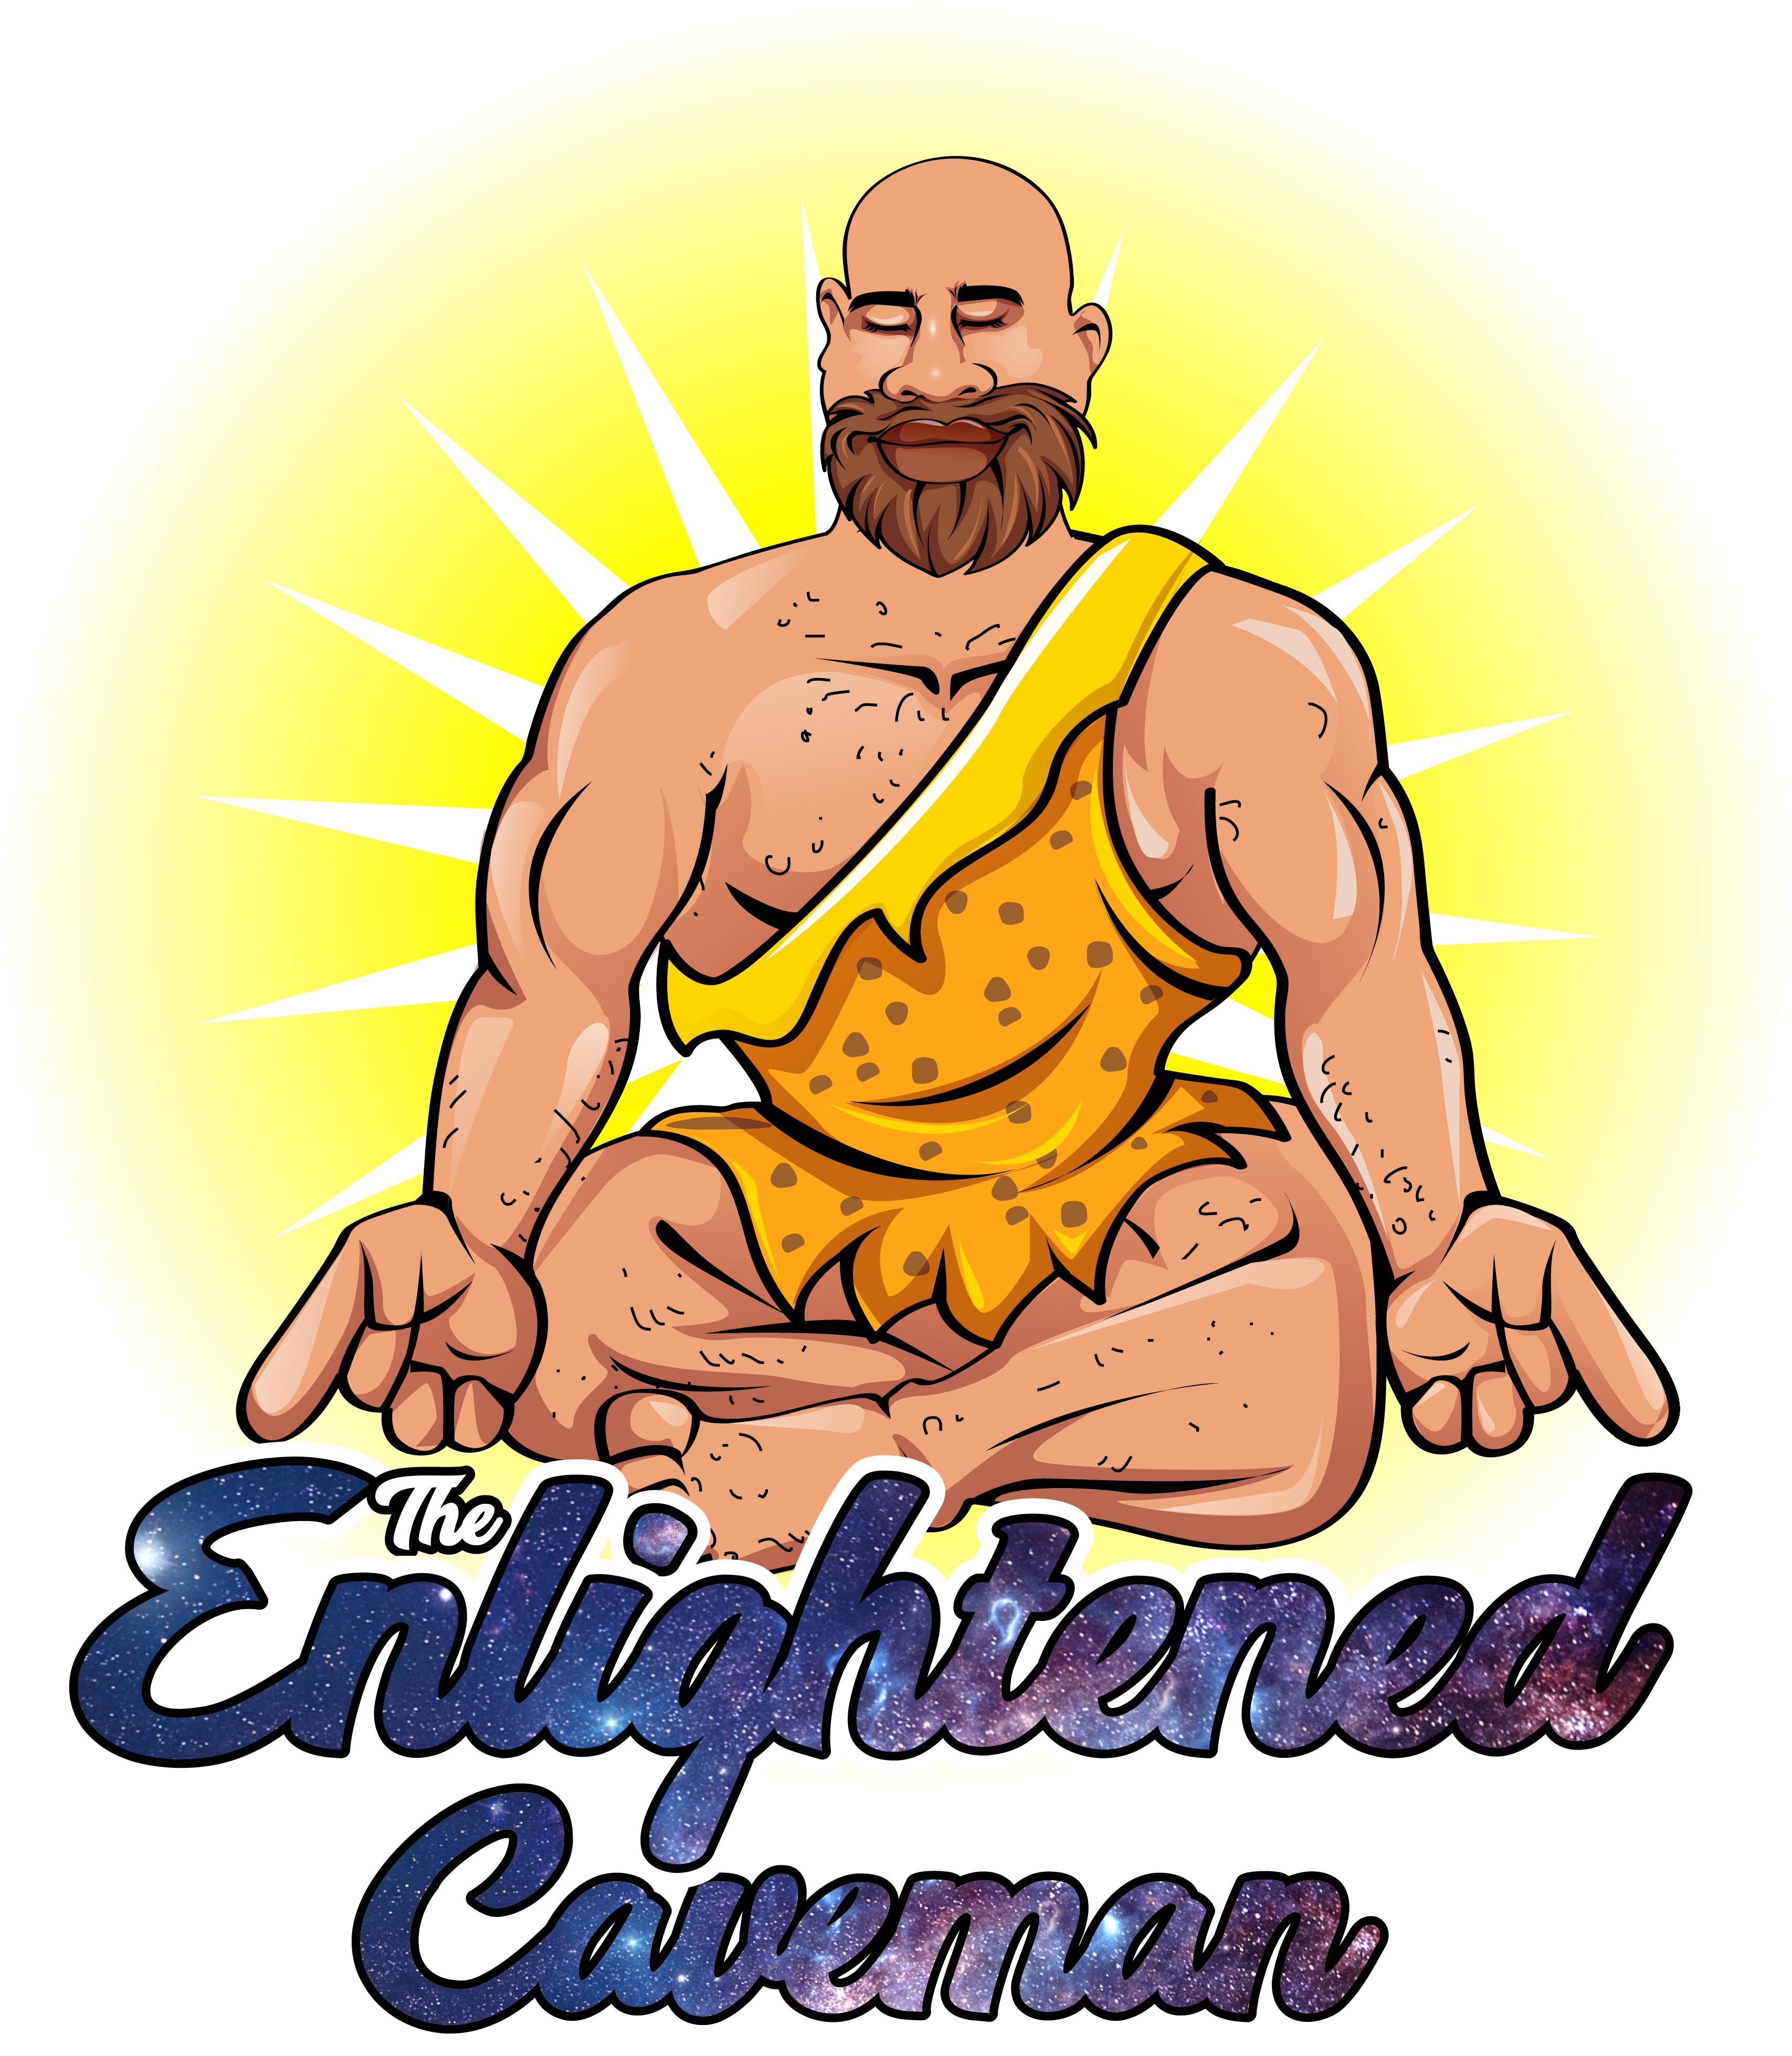 The Enlightened Caveman